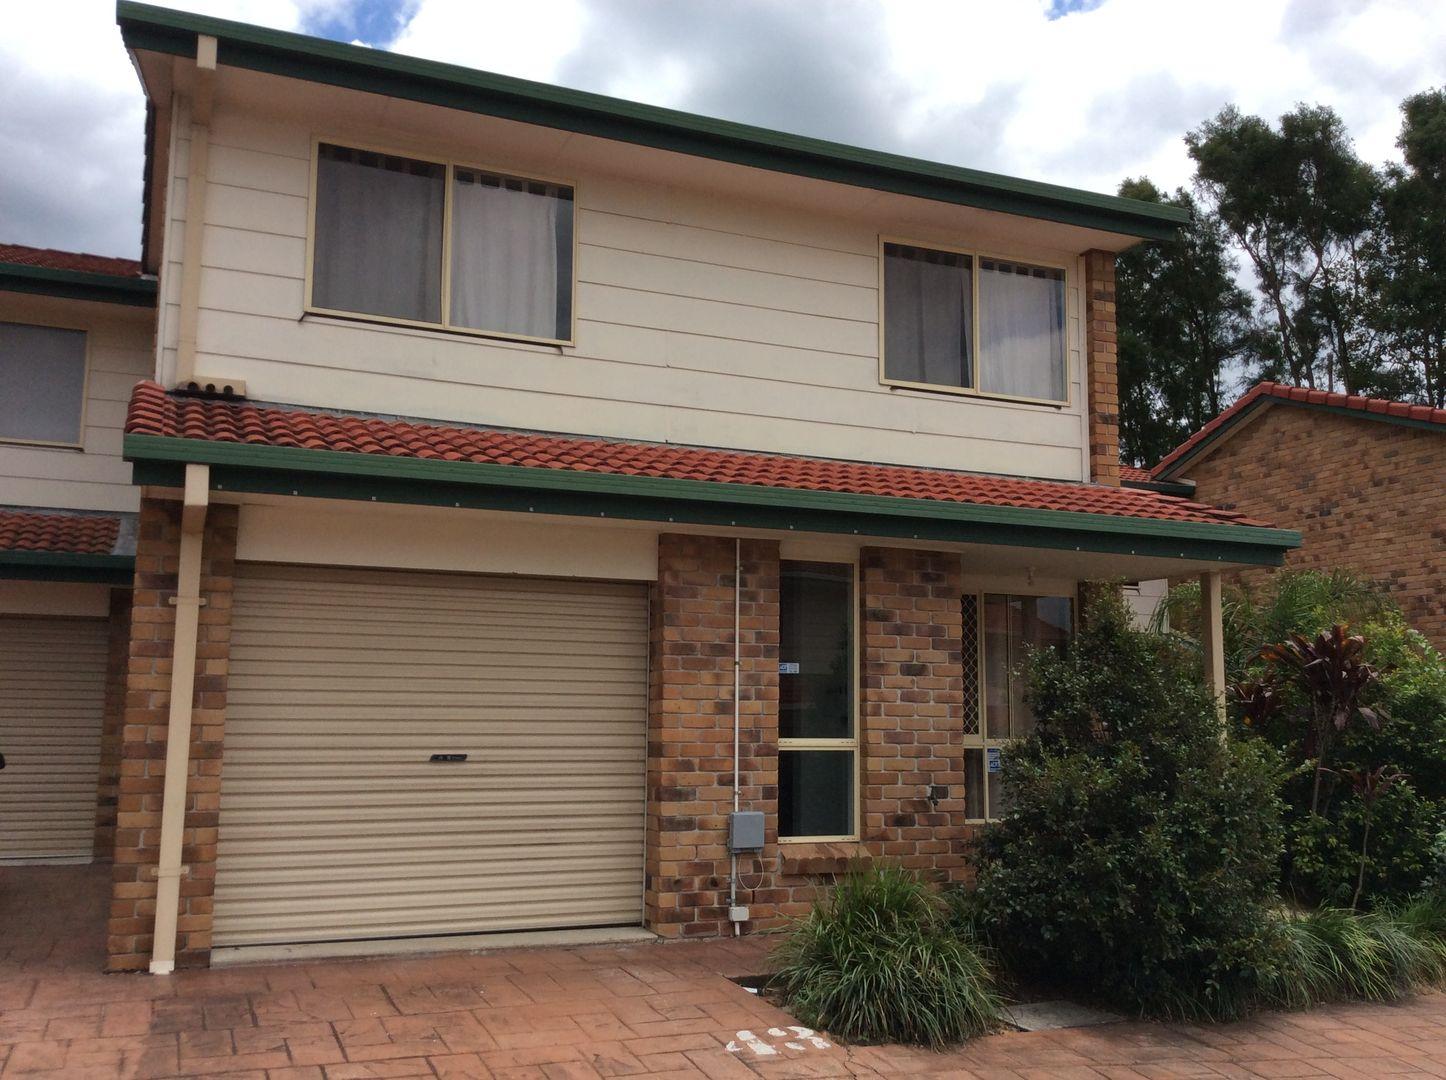 43/13 Bridge Street, Redbank QLD 4301, Image 0